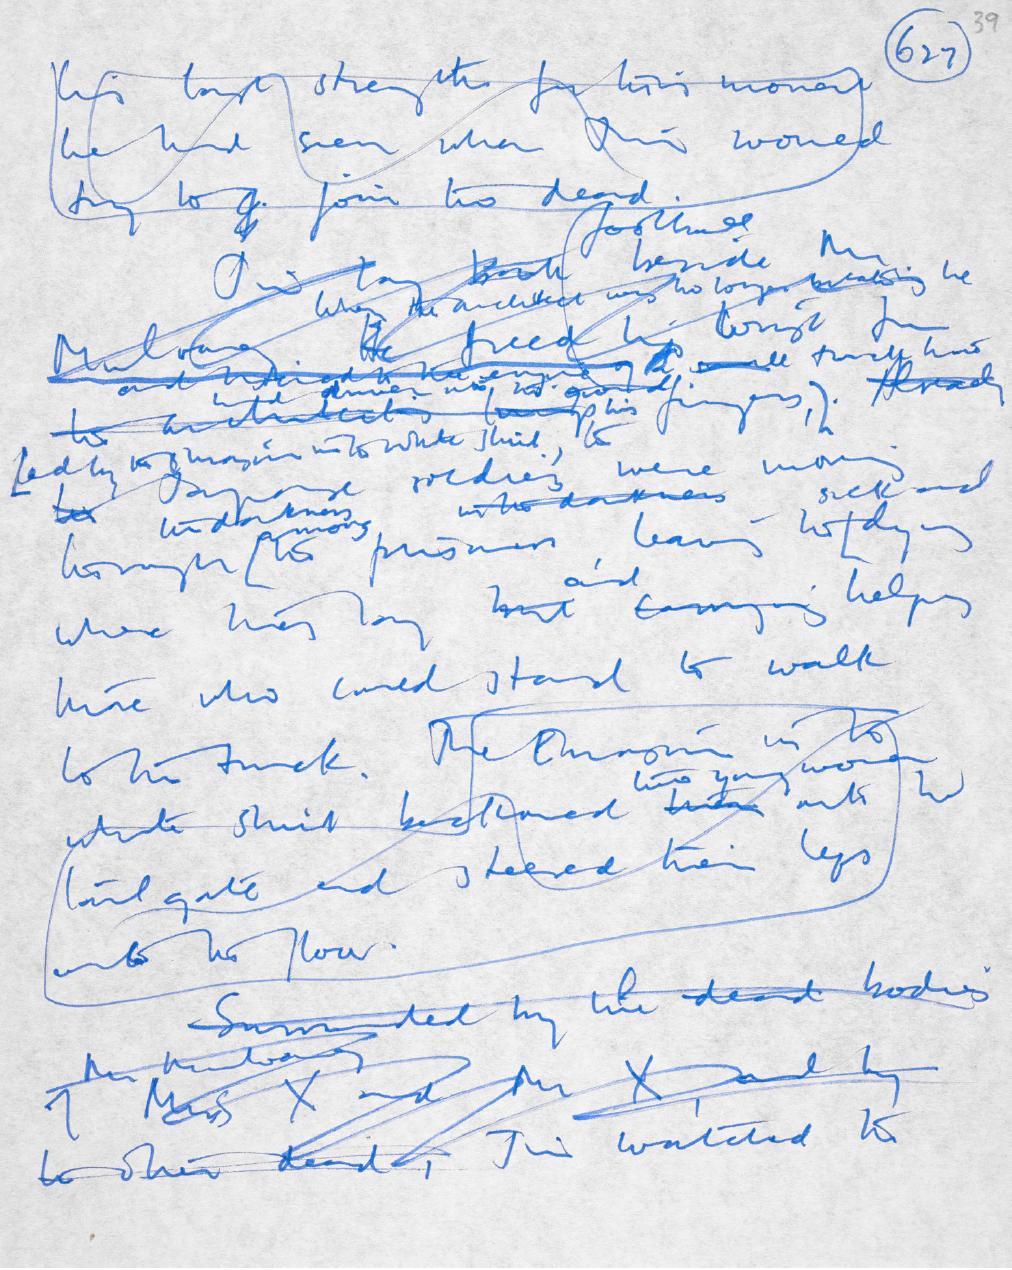 J·G·巴拉德手稿 The Papers of James Graham Ballard: 'The Empire of the Sun' (Autograph Manuscript): 627图源大英图书馆